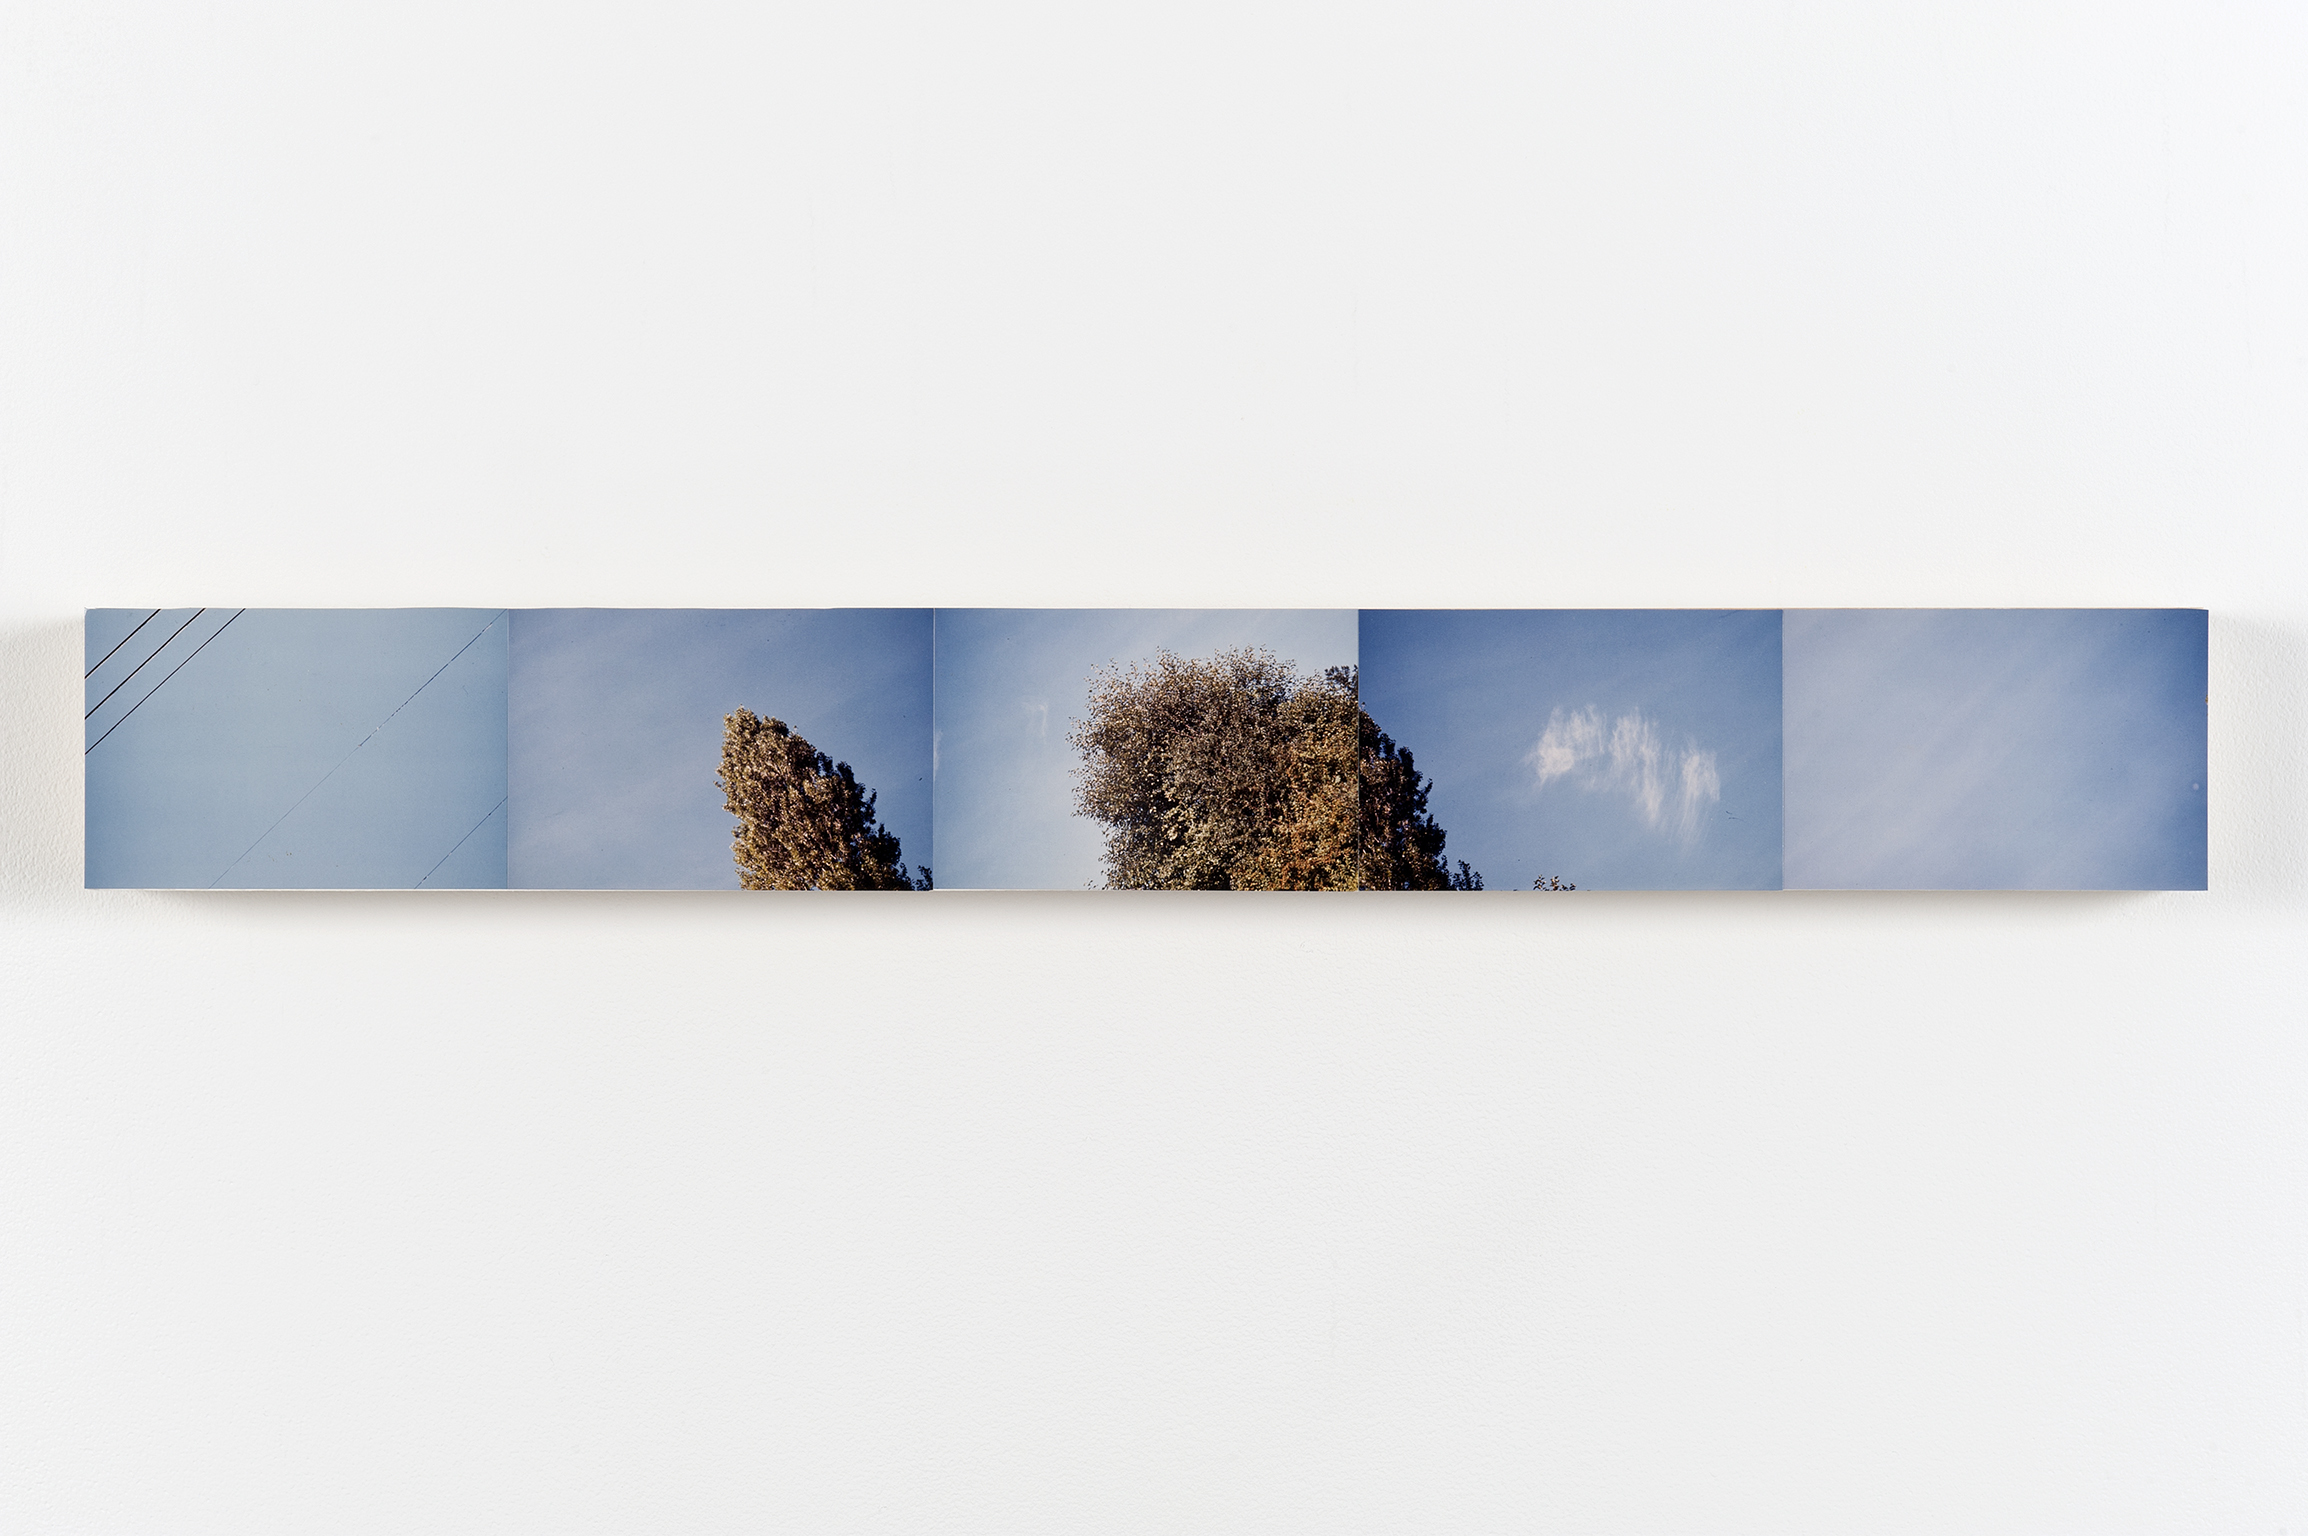 Robert Kleyn, Sky Pan, 1974, colour photographs, 4 x 30 in. (10 x 75 cm)   by